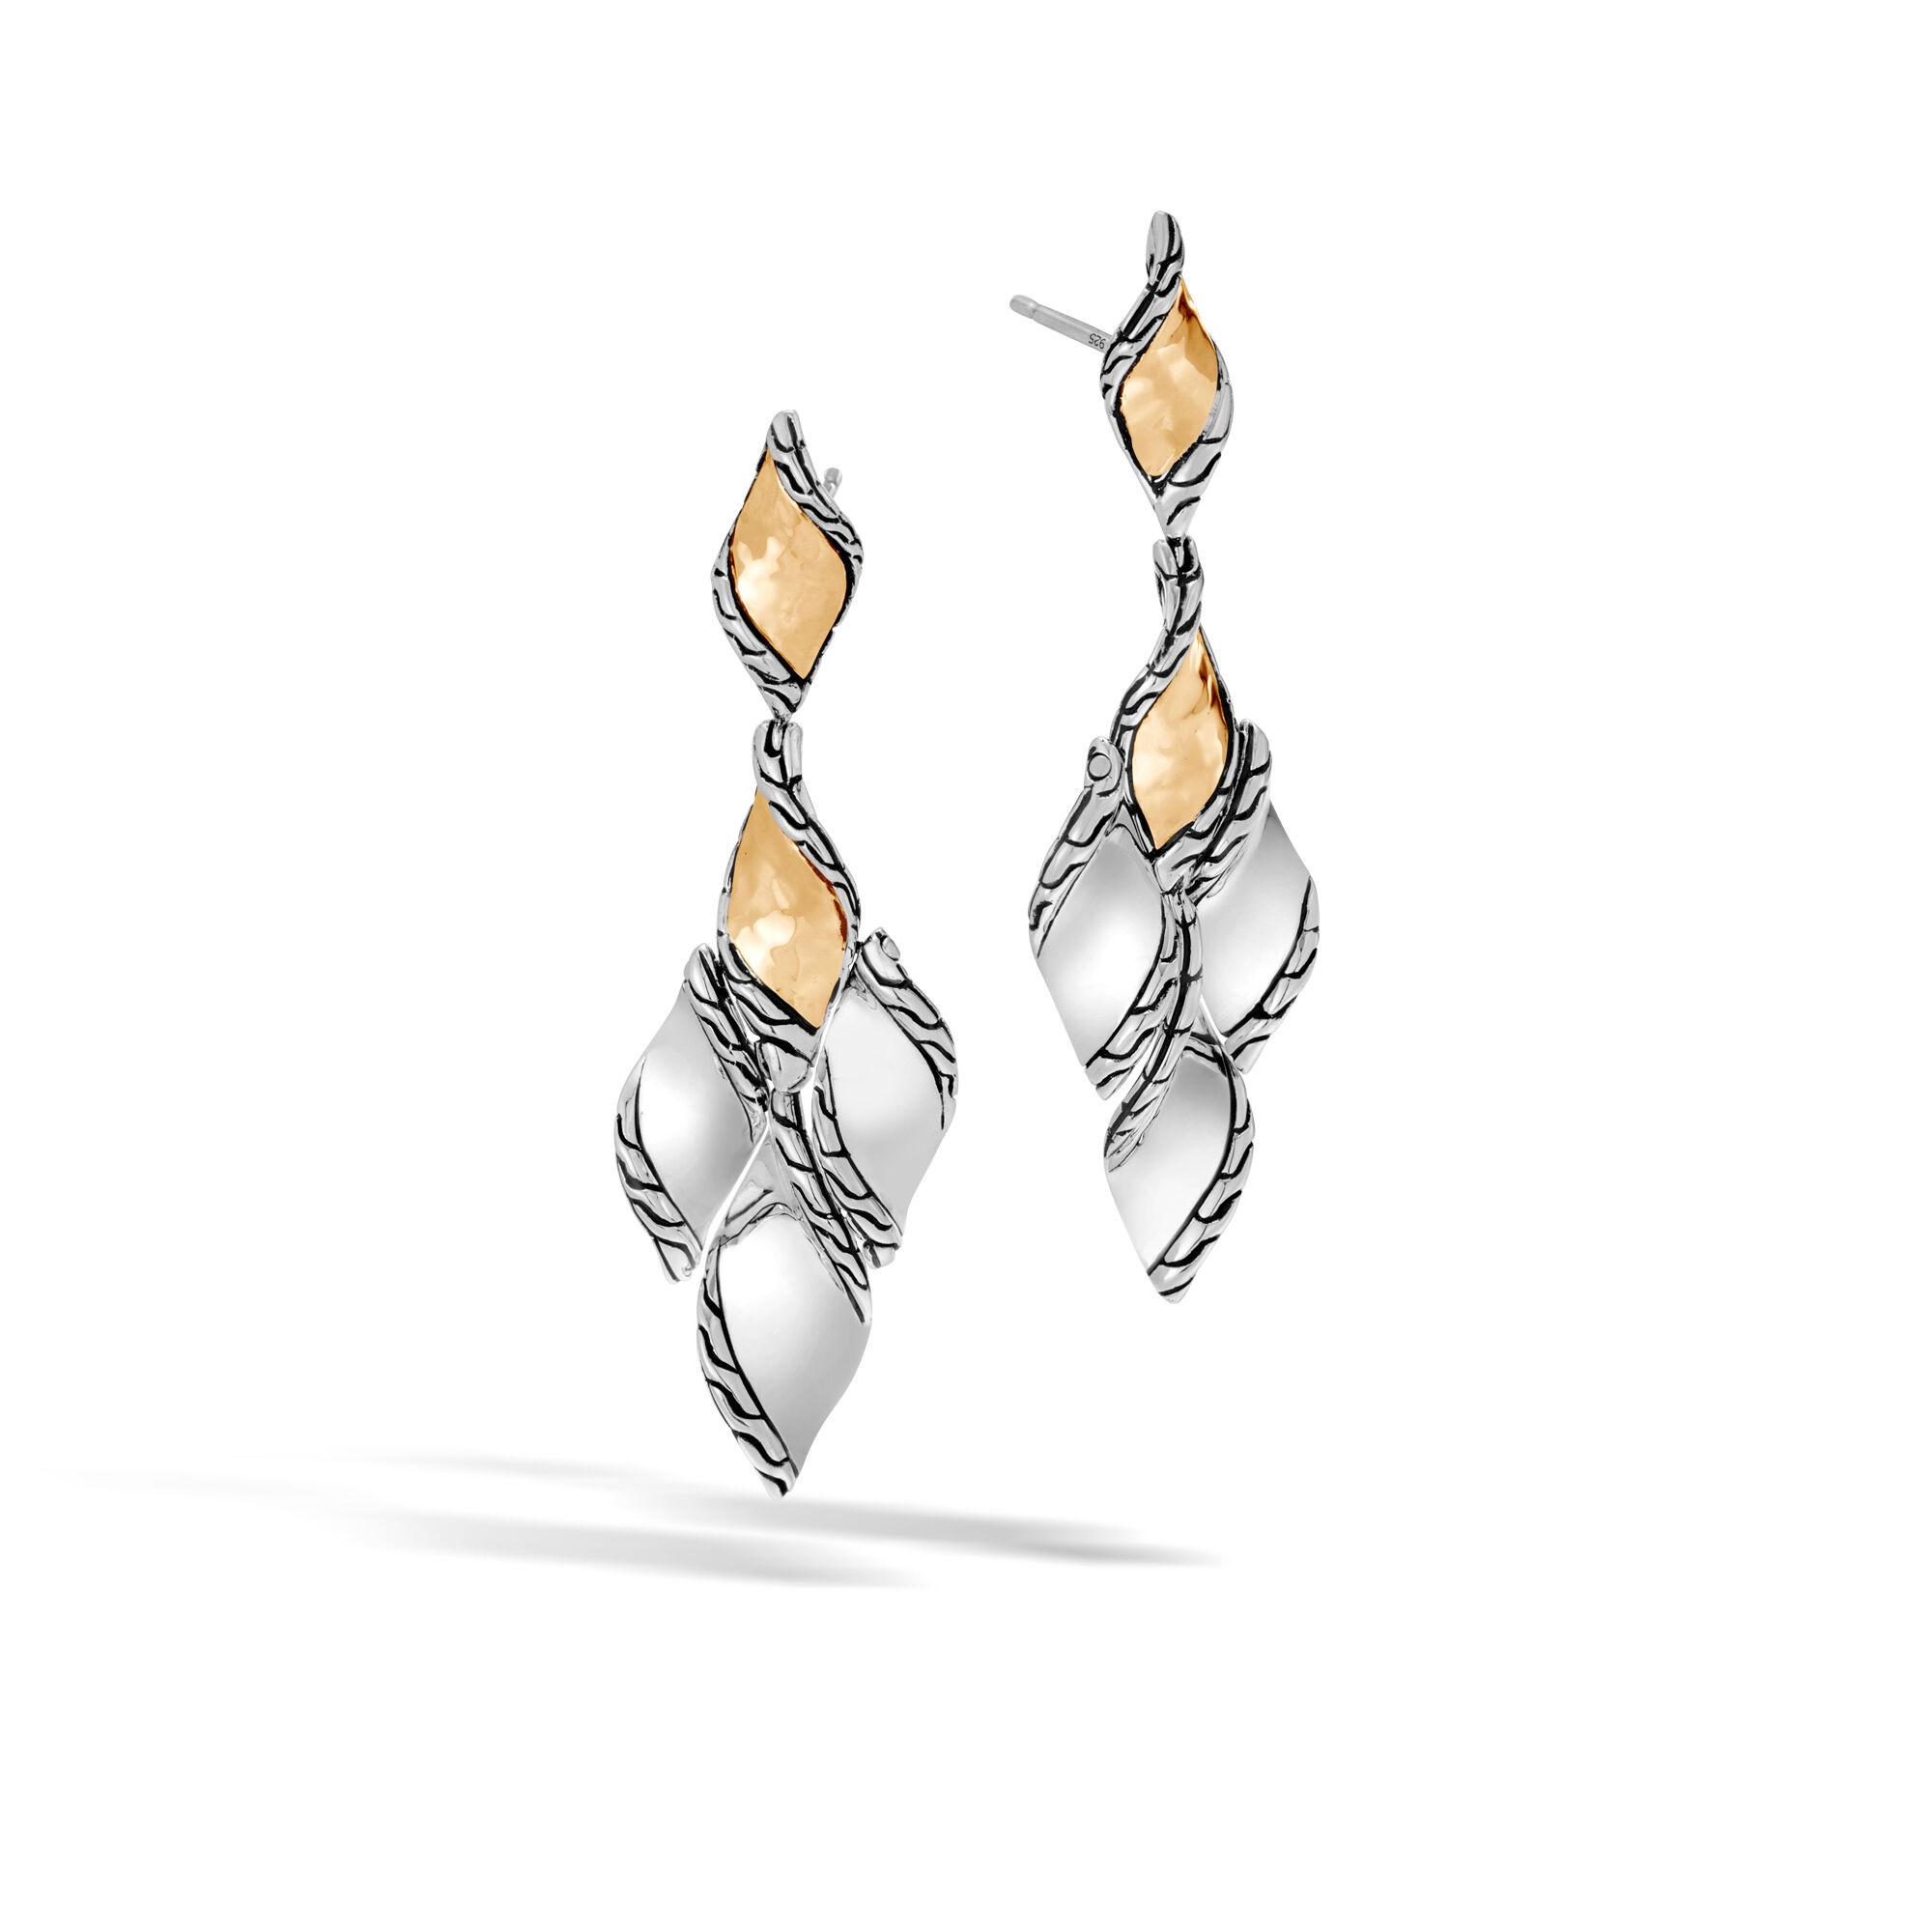 John Hardy Classic Chain Hammered 18K Teardrop Earrings z0QLQQXW